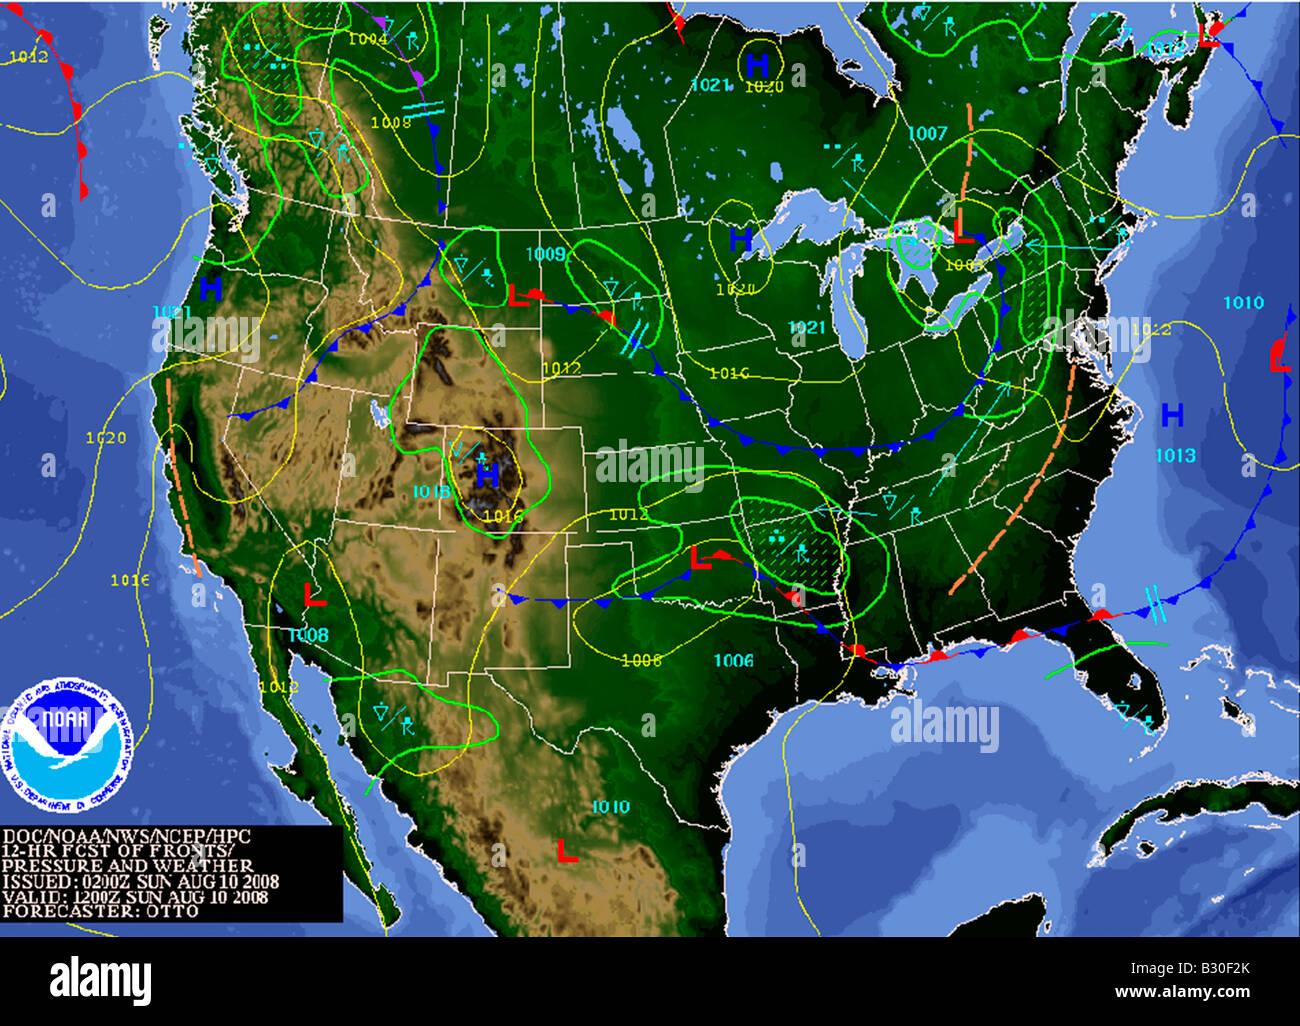 weather map North America Stock Photo: 19066171   Alamy